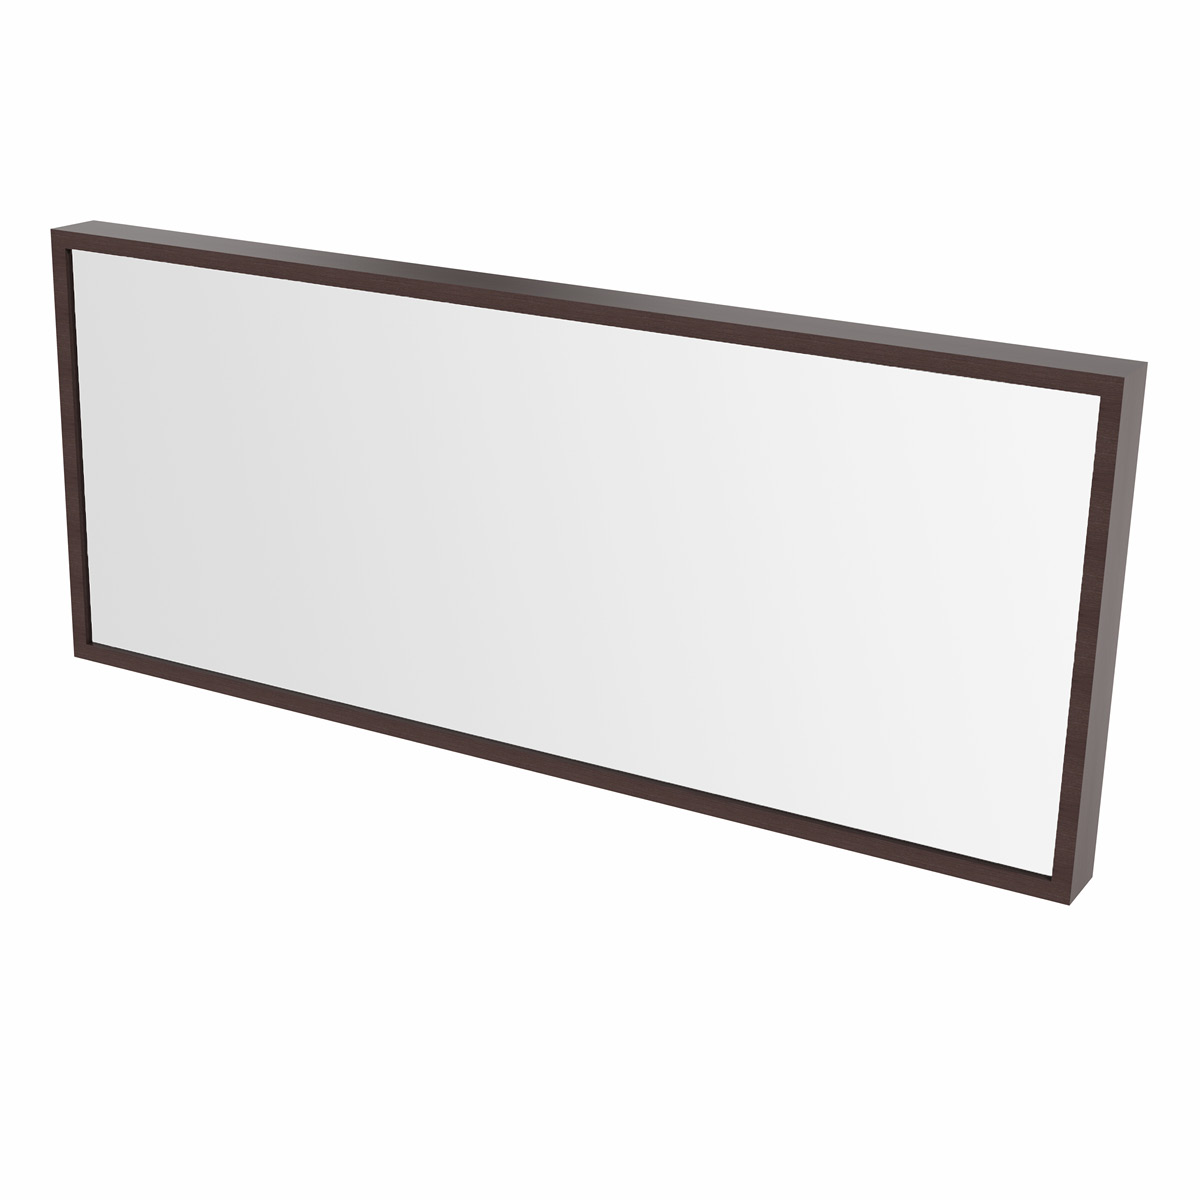 KZOAO Spiegel 120 cm breit C011